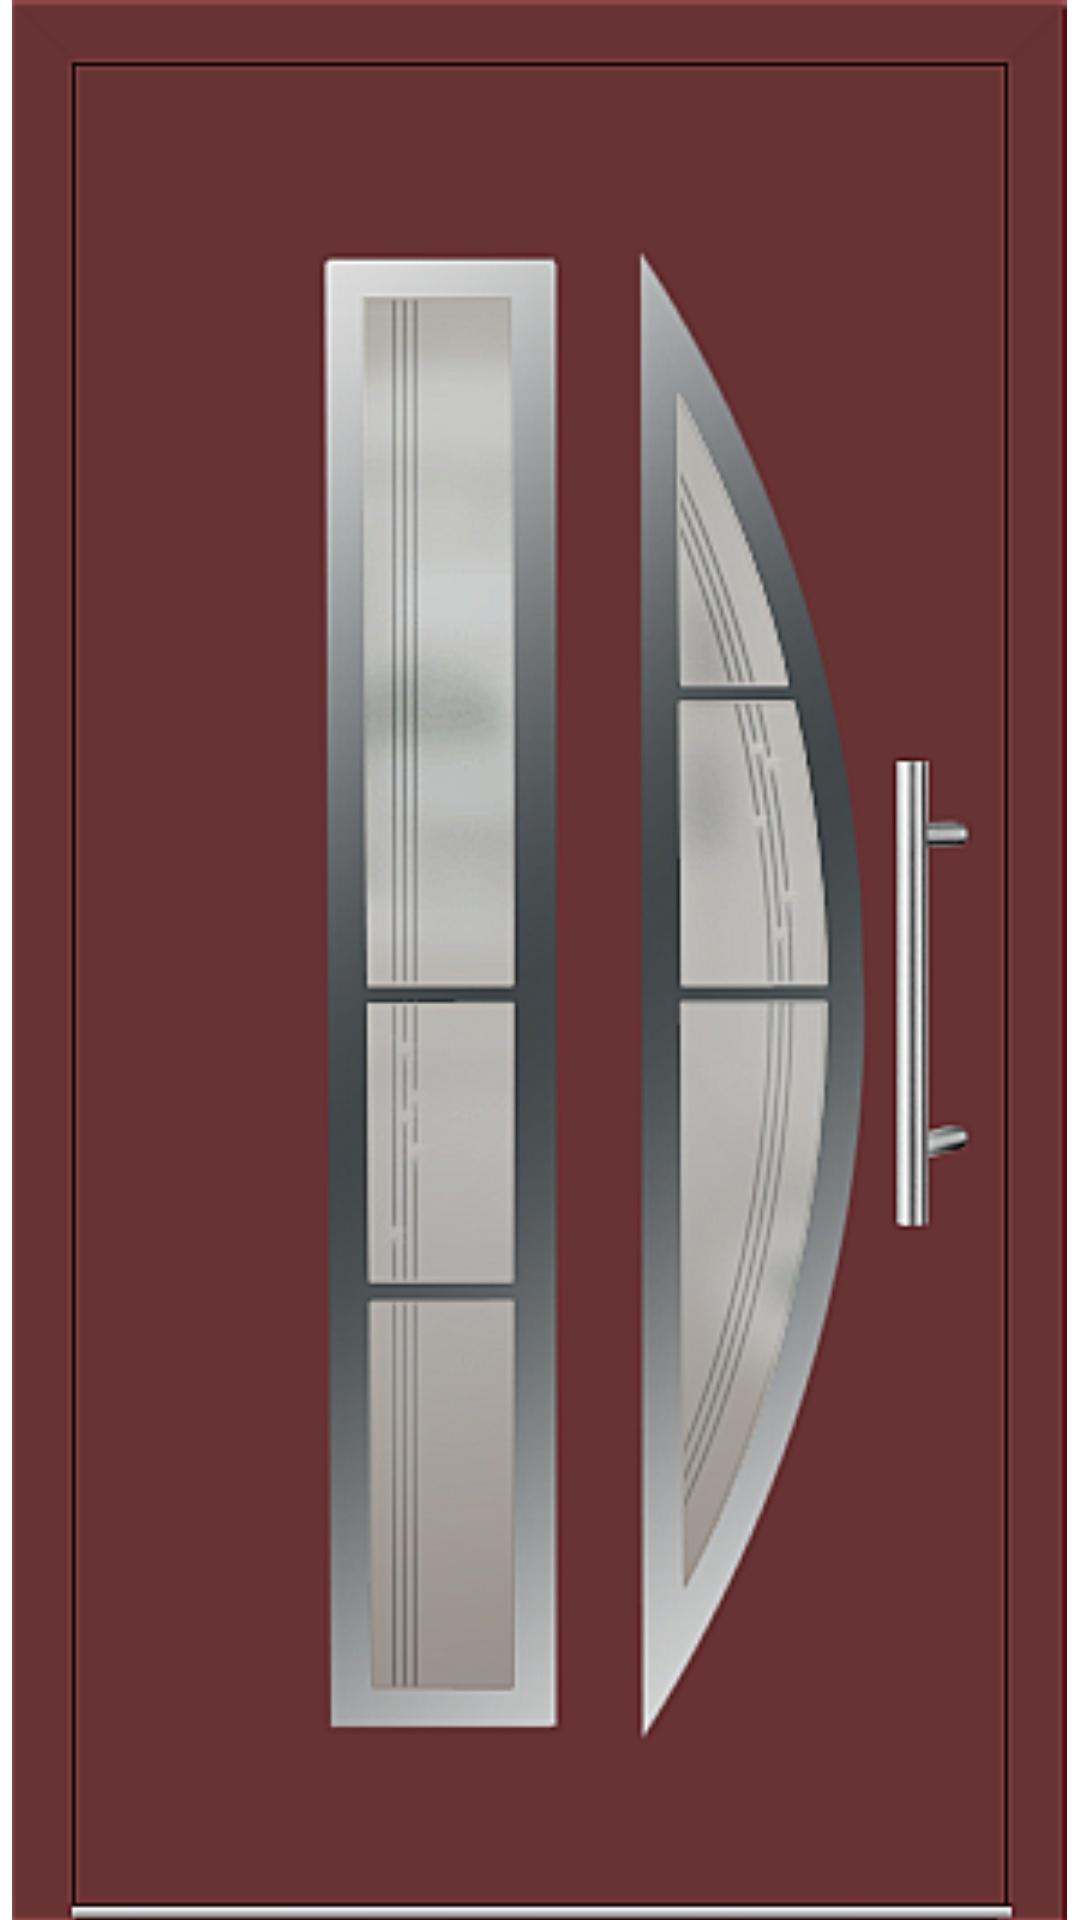 Aluminium Haustür Modell 6525-75 braunrot